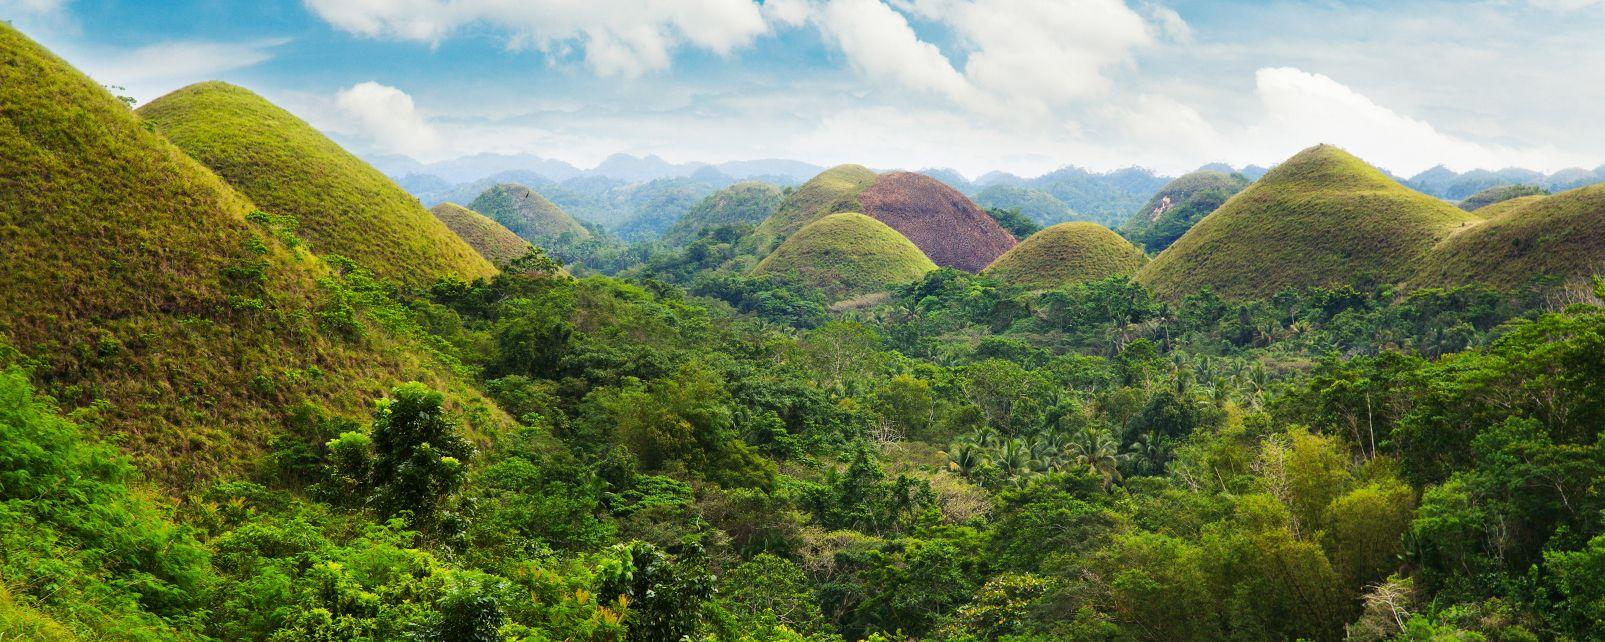 Les paysages, Bohol, philippines, Asie, chocolate hills, montagne